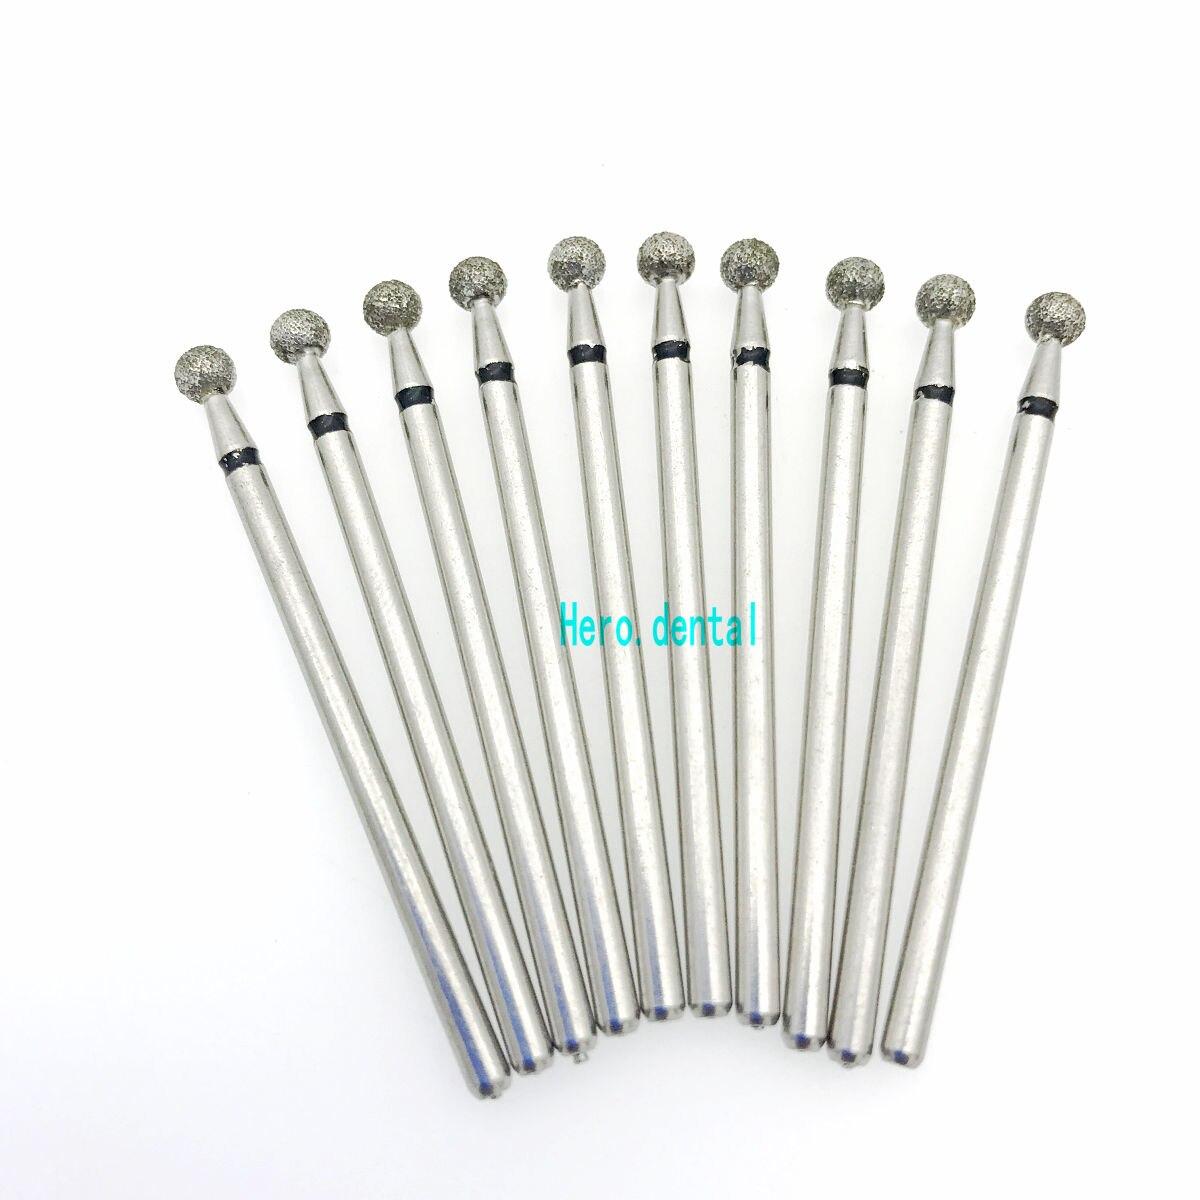 50PCS 1.6mm Carborundum Burs Teeth Polishing Fittings for High Speed Hand Tools